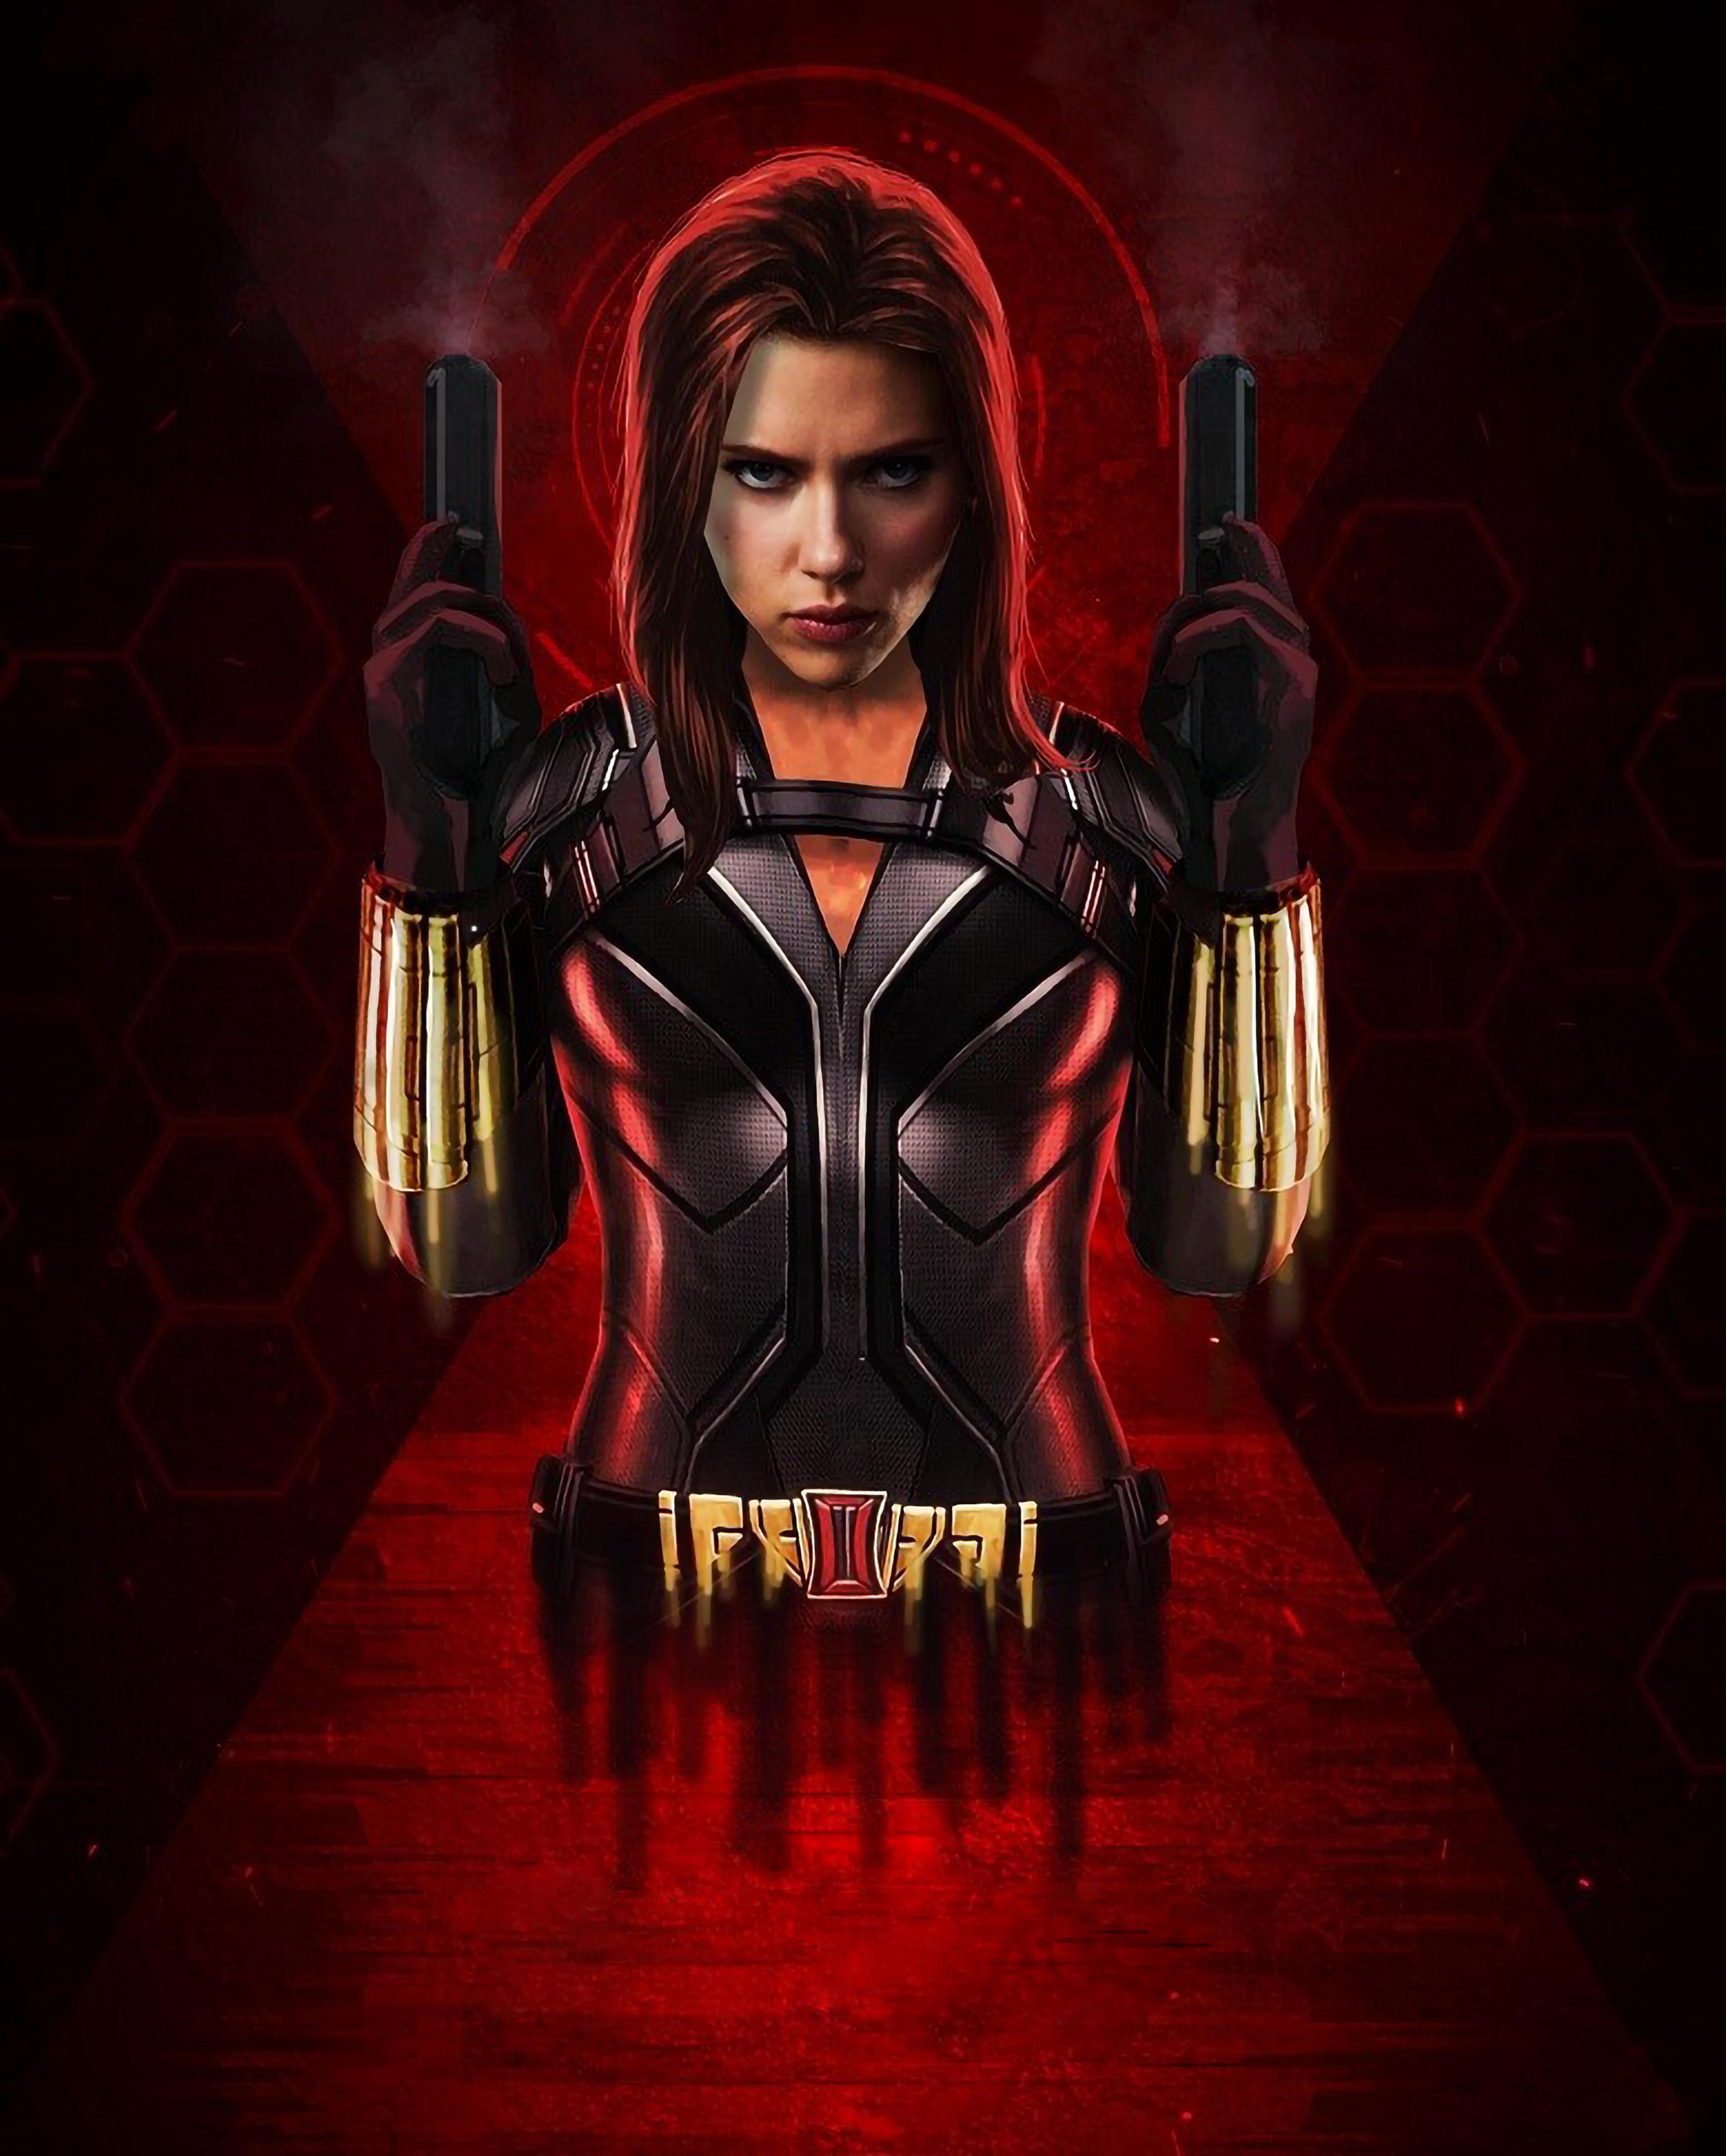 Black Widow 2020 Art Wallpaper, HD Movies 4K Wallpapers ...